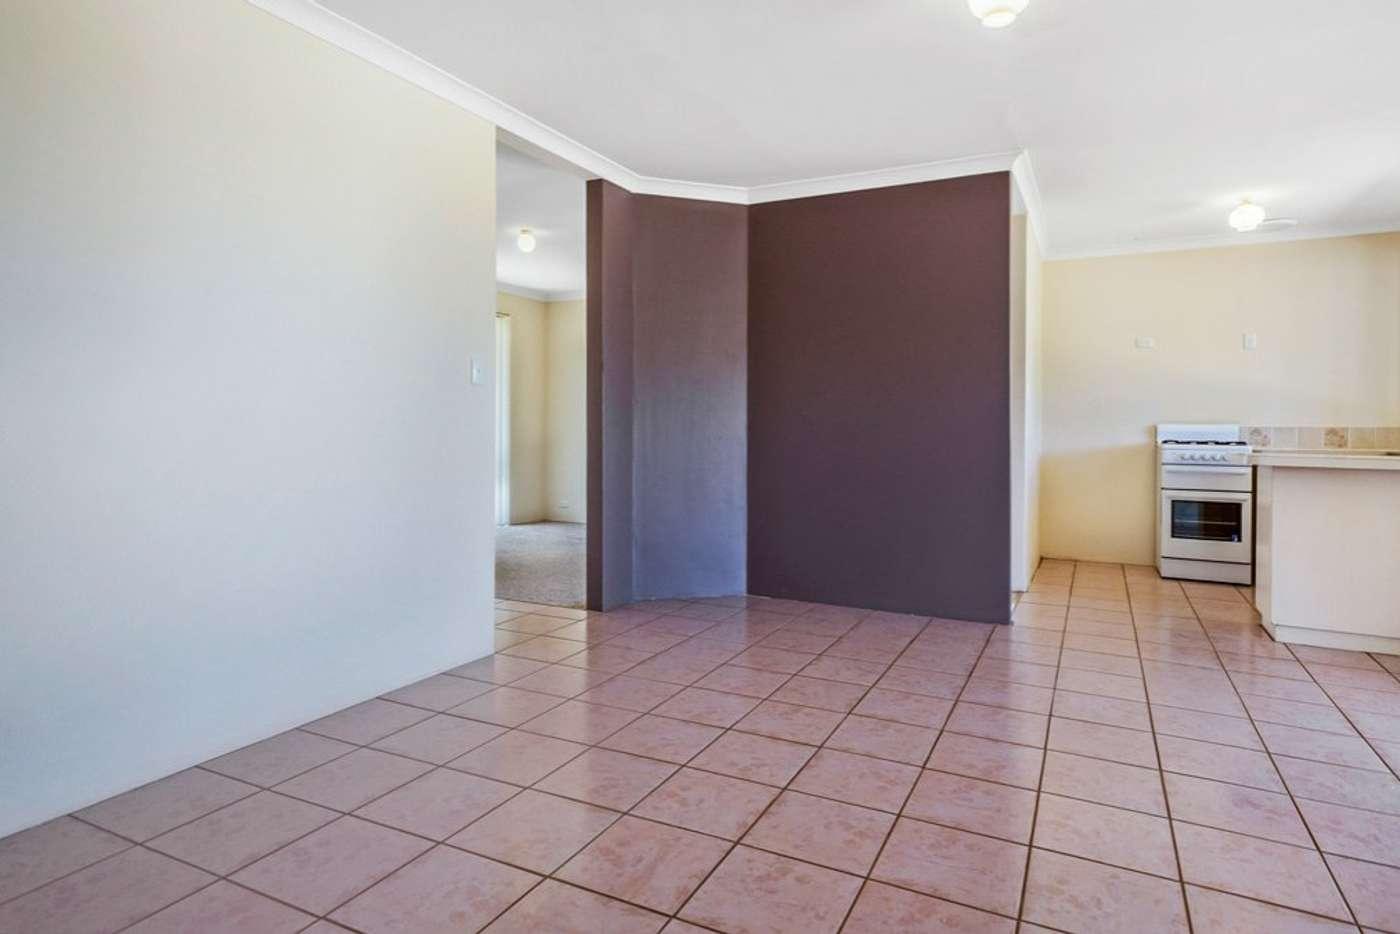 Seventh view of Homely house listing, 129 Parmelia Avenue, Parmelia WA 6167